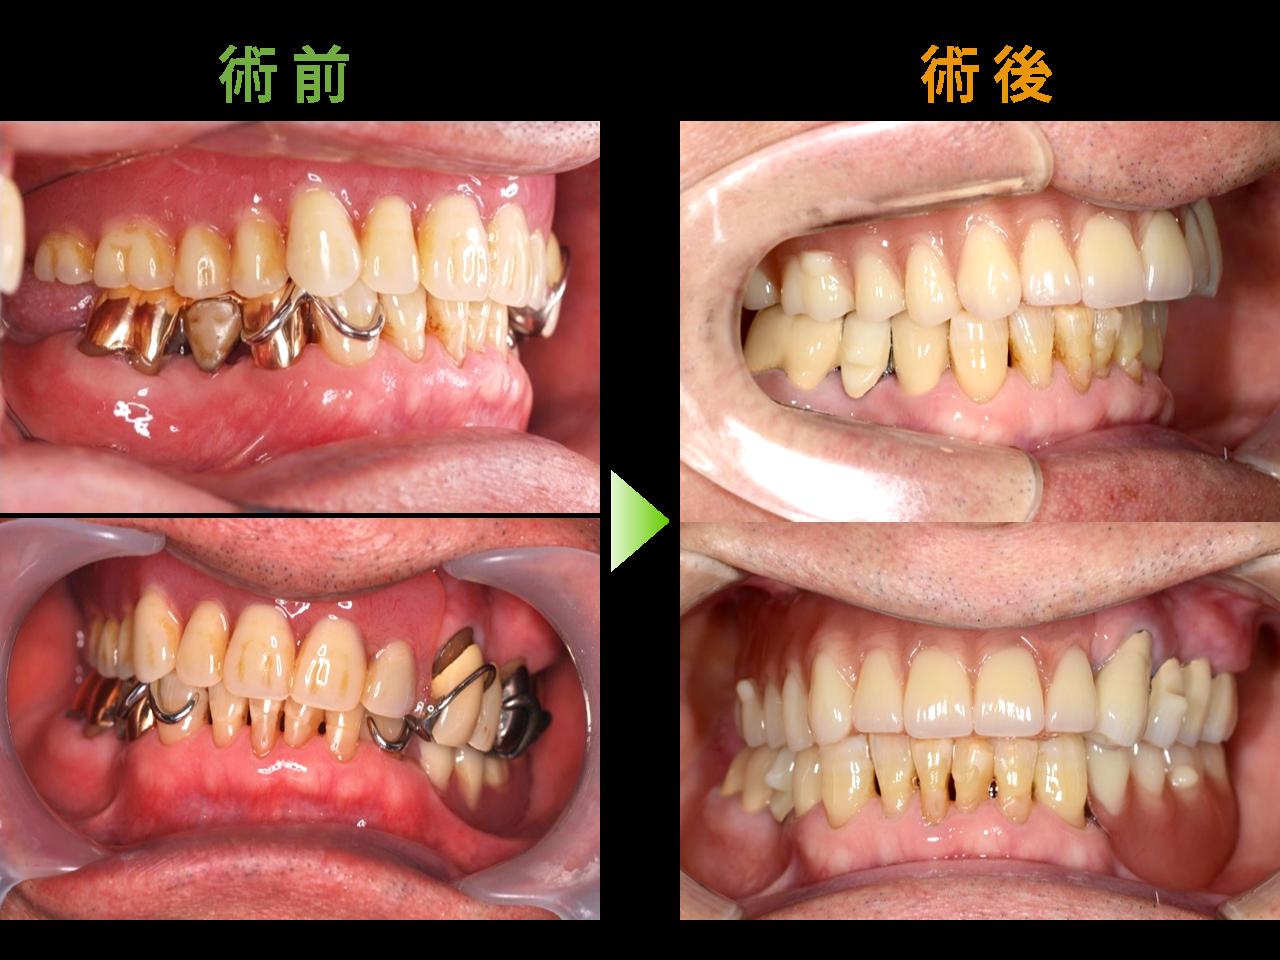 BPS -生体機能補綴システム-による義歯症例02